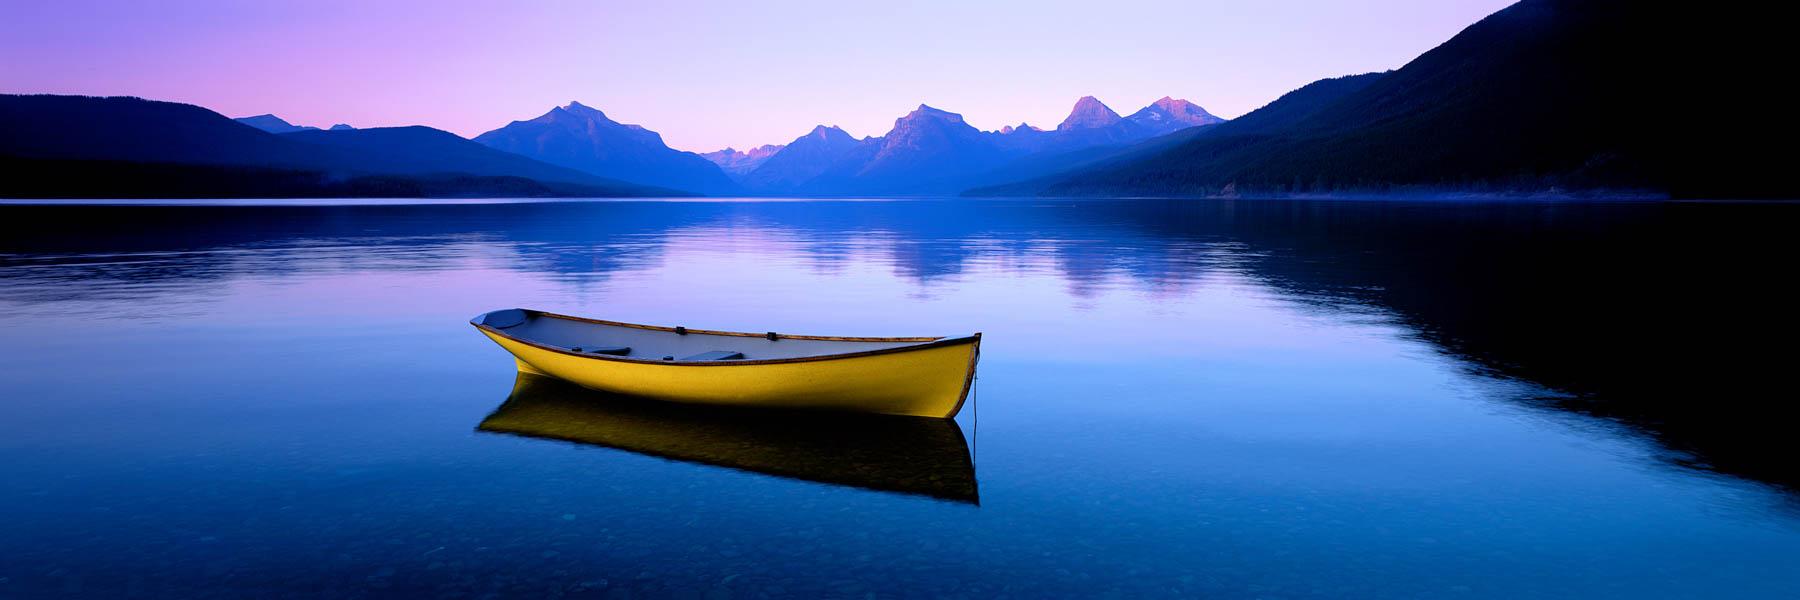 A solitary yellow canoe on Lake McDonald, Monana, USA.